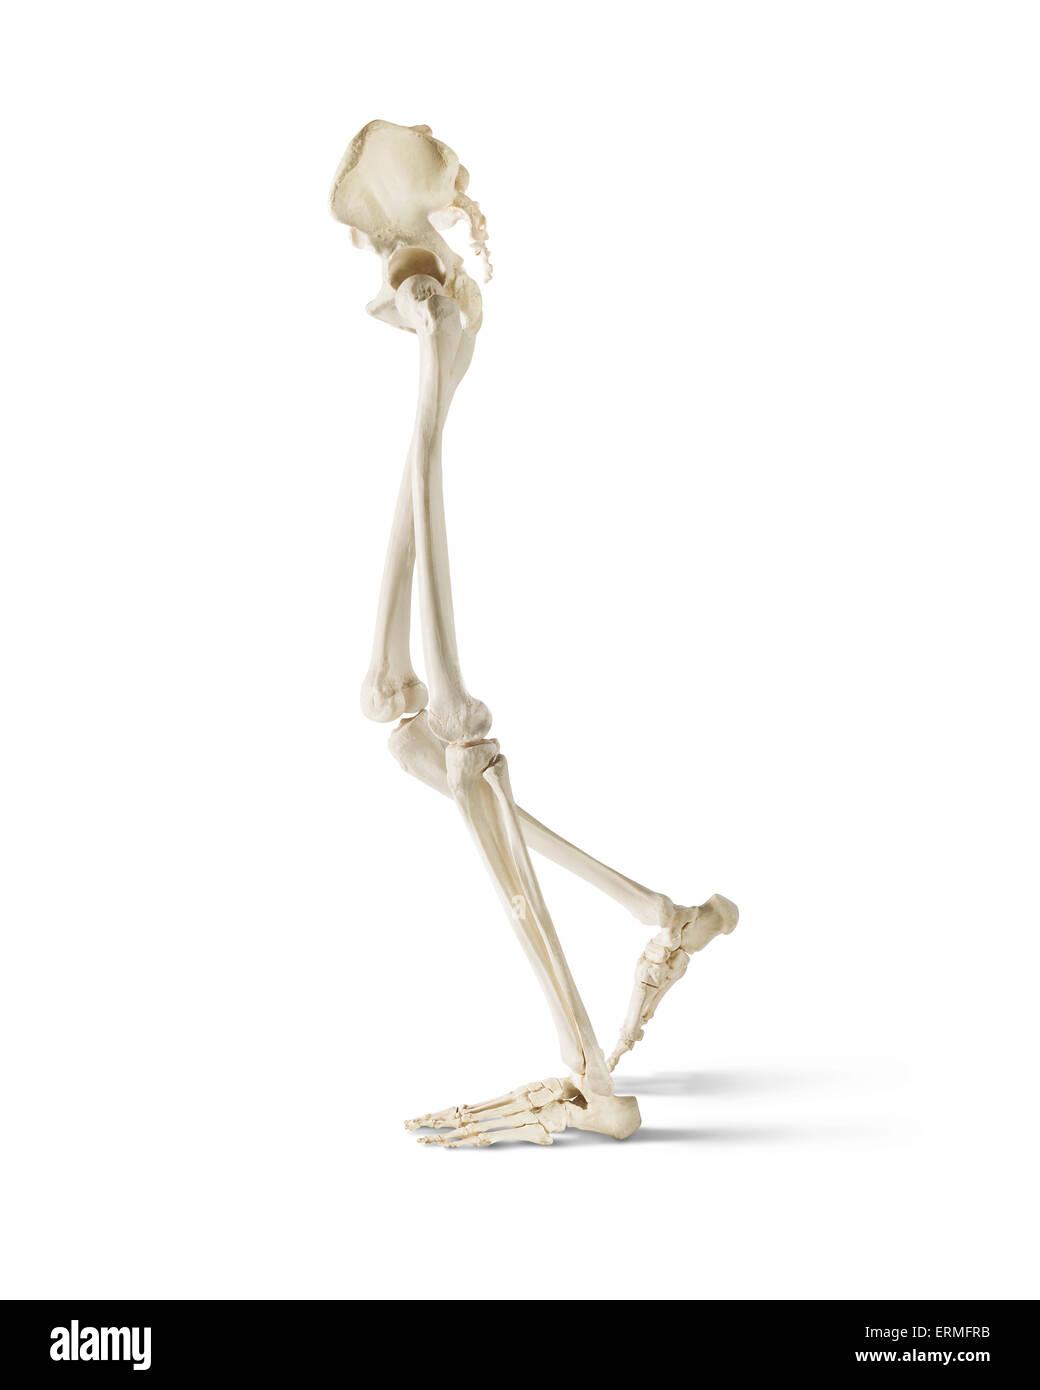 Leg And Hip Bones Walking On A White Background Stock Photo